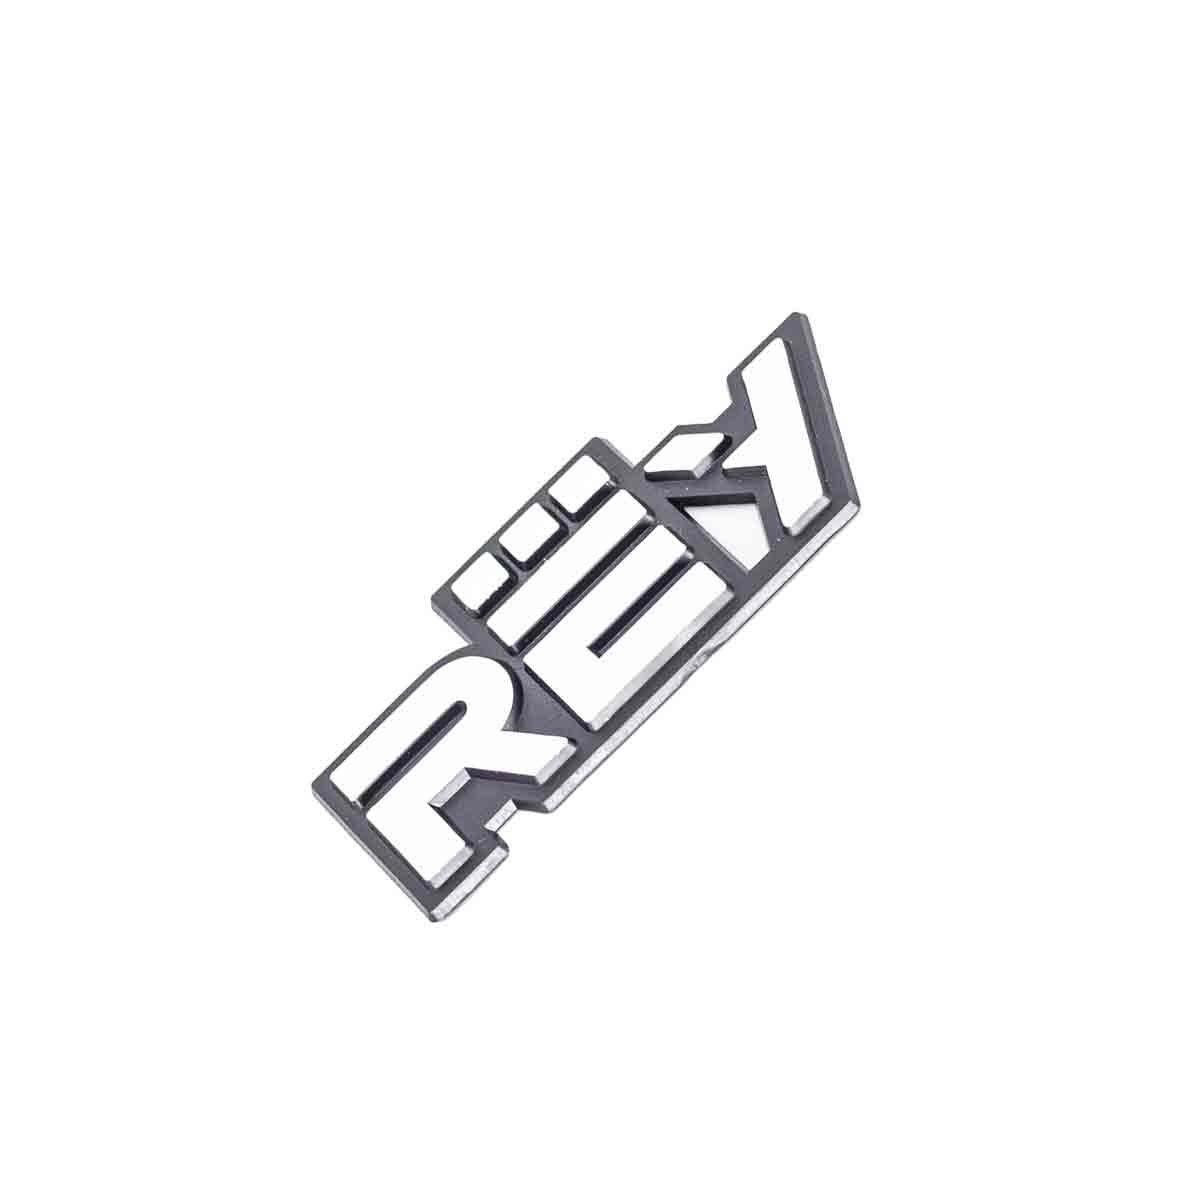 Emblema Rey Moderno